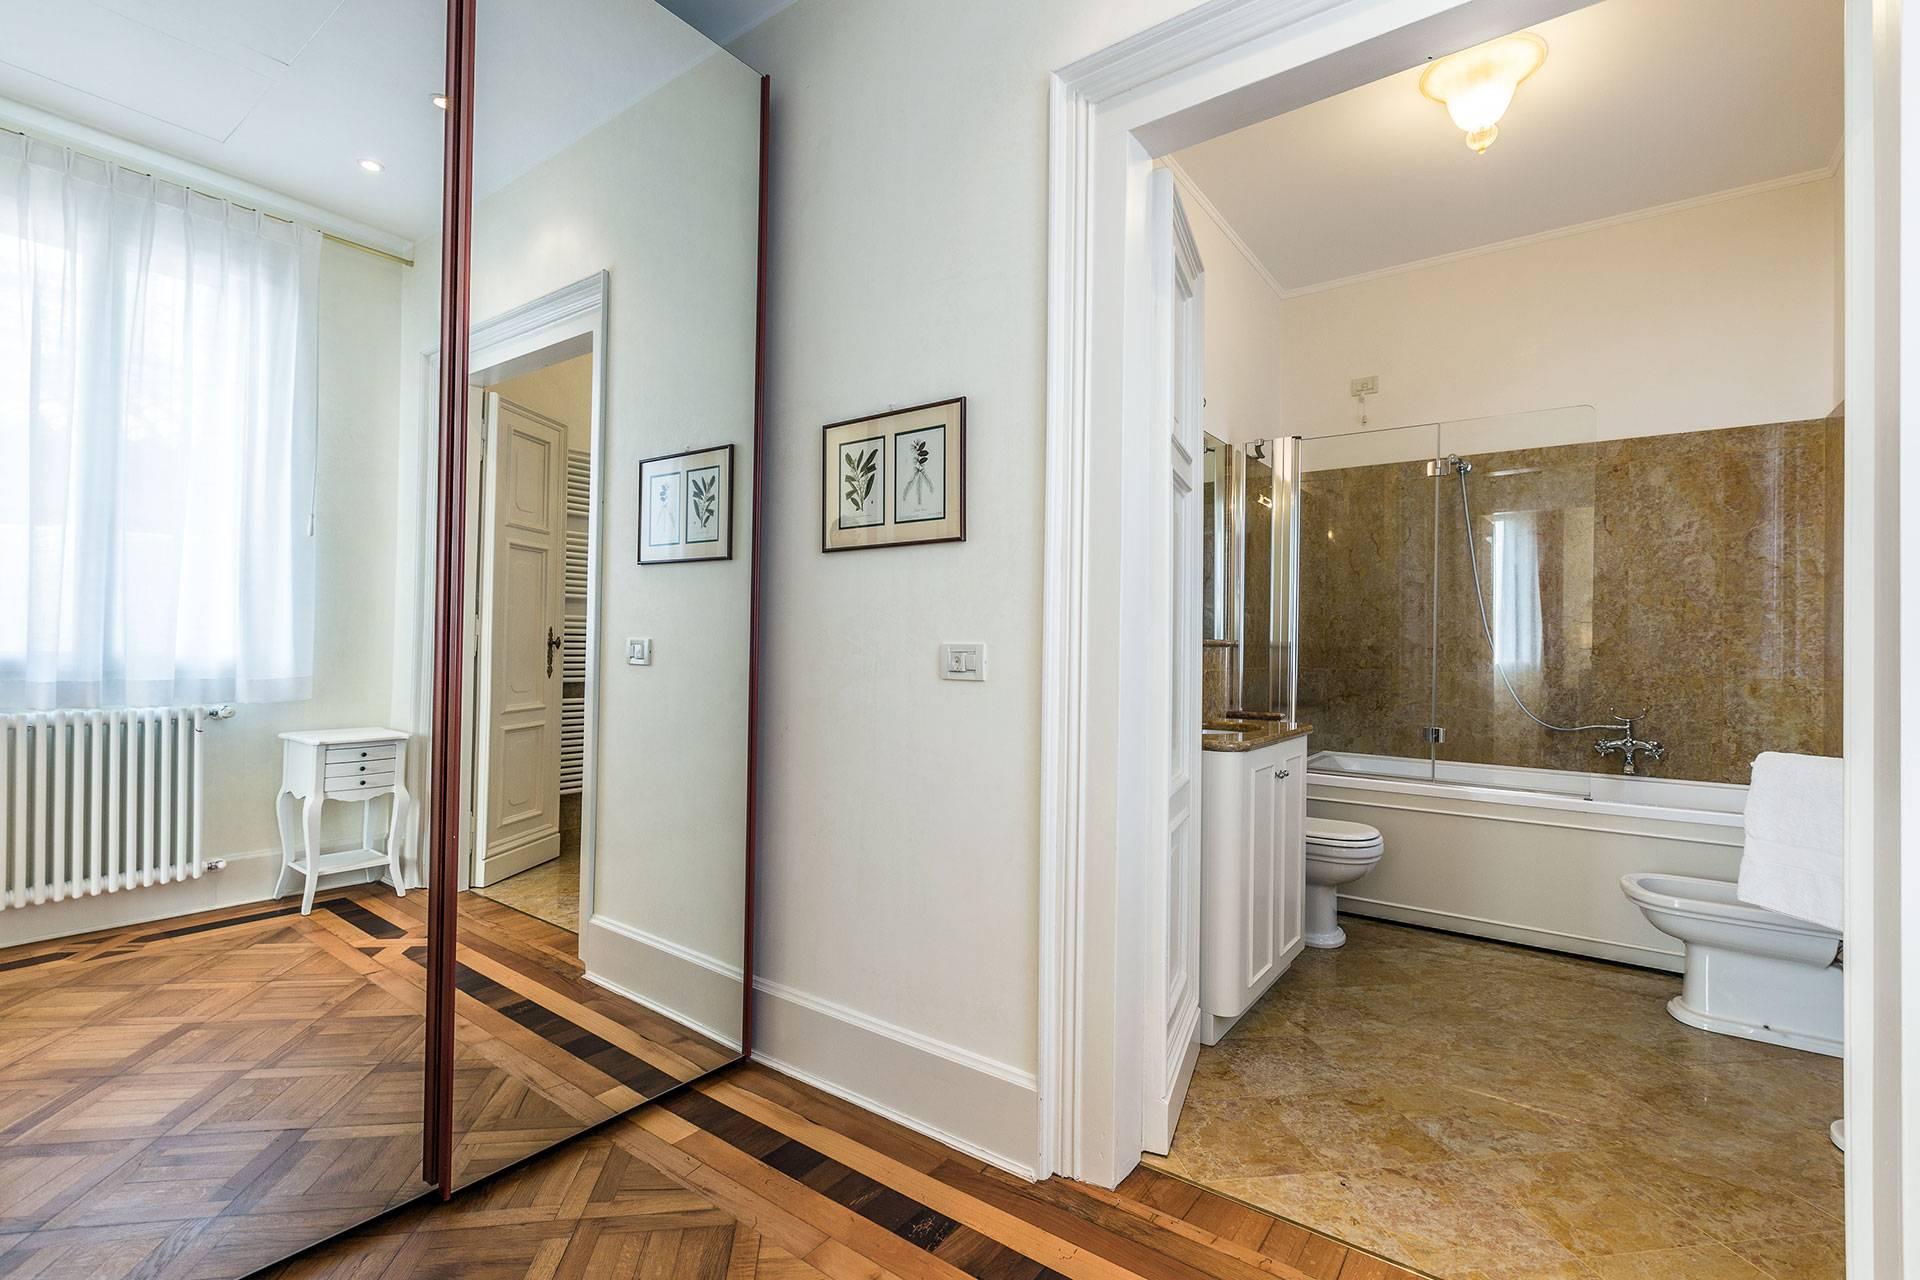 walk-in wardrobe between the bedroom and the bathroom